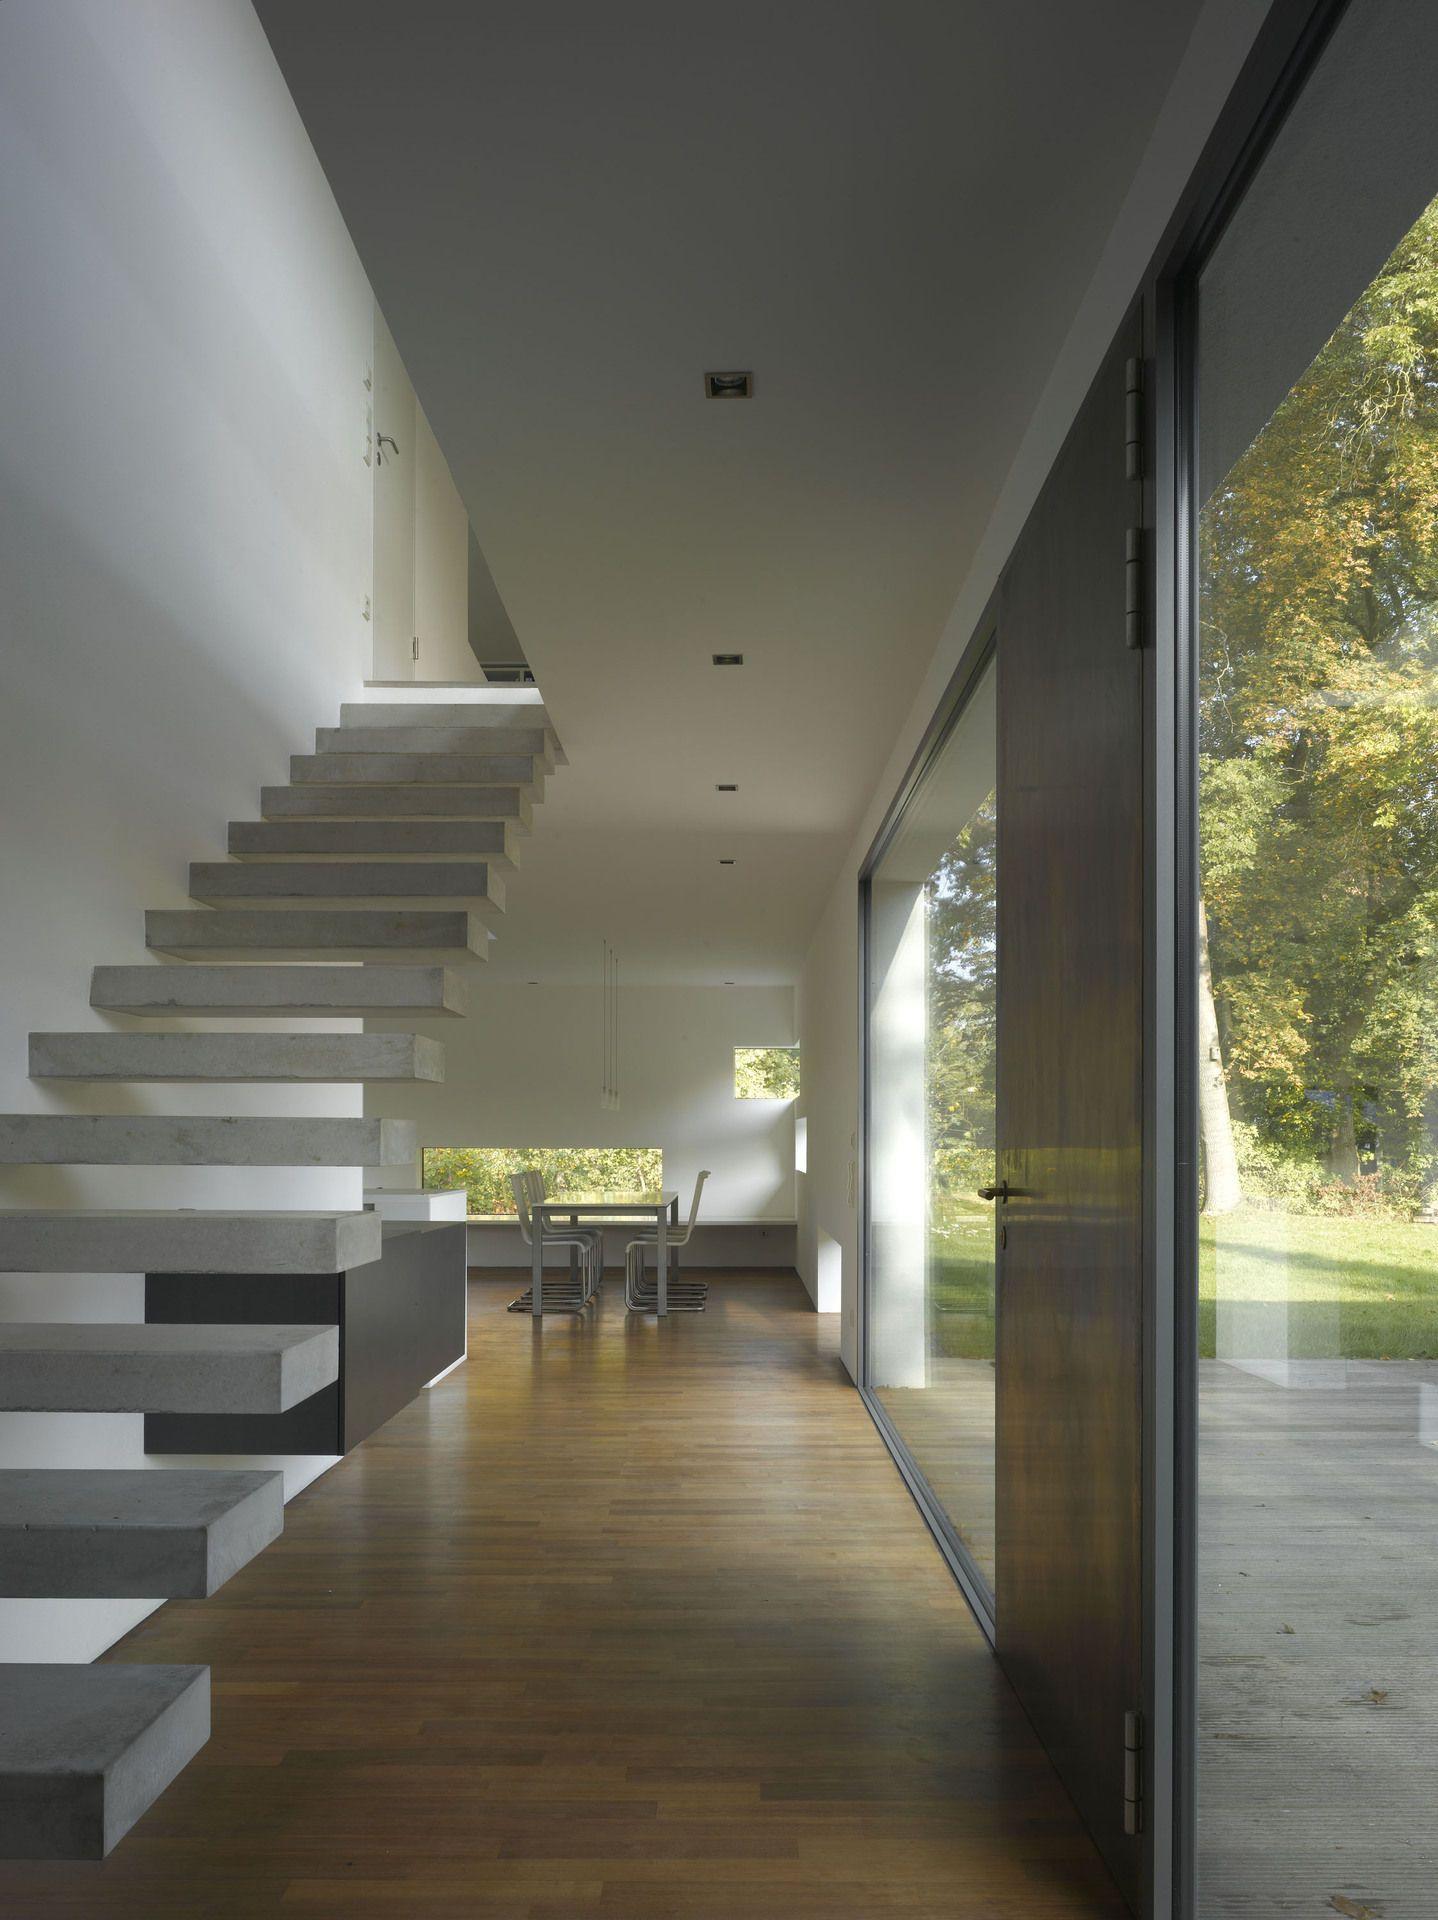 kragarmtreppe aus beton treppen design. Black Bedroom Furniture Sets. Home Design Ideas